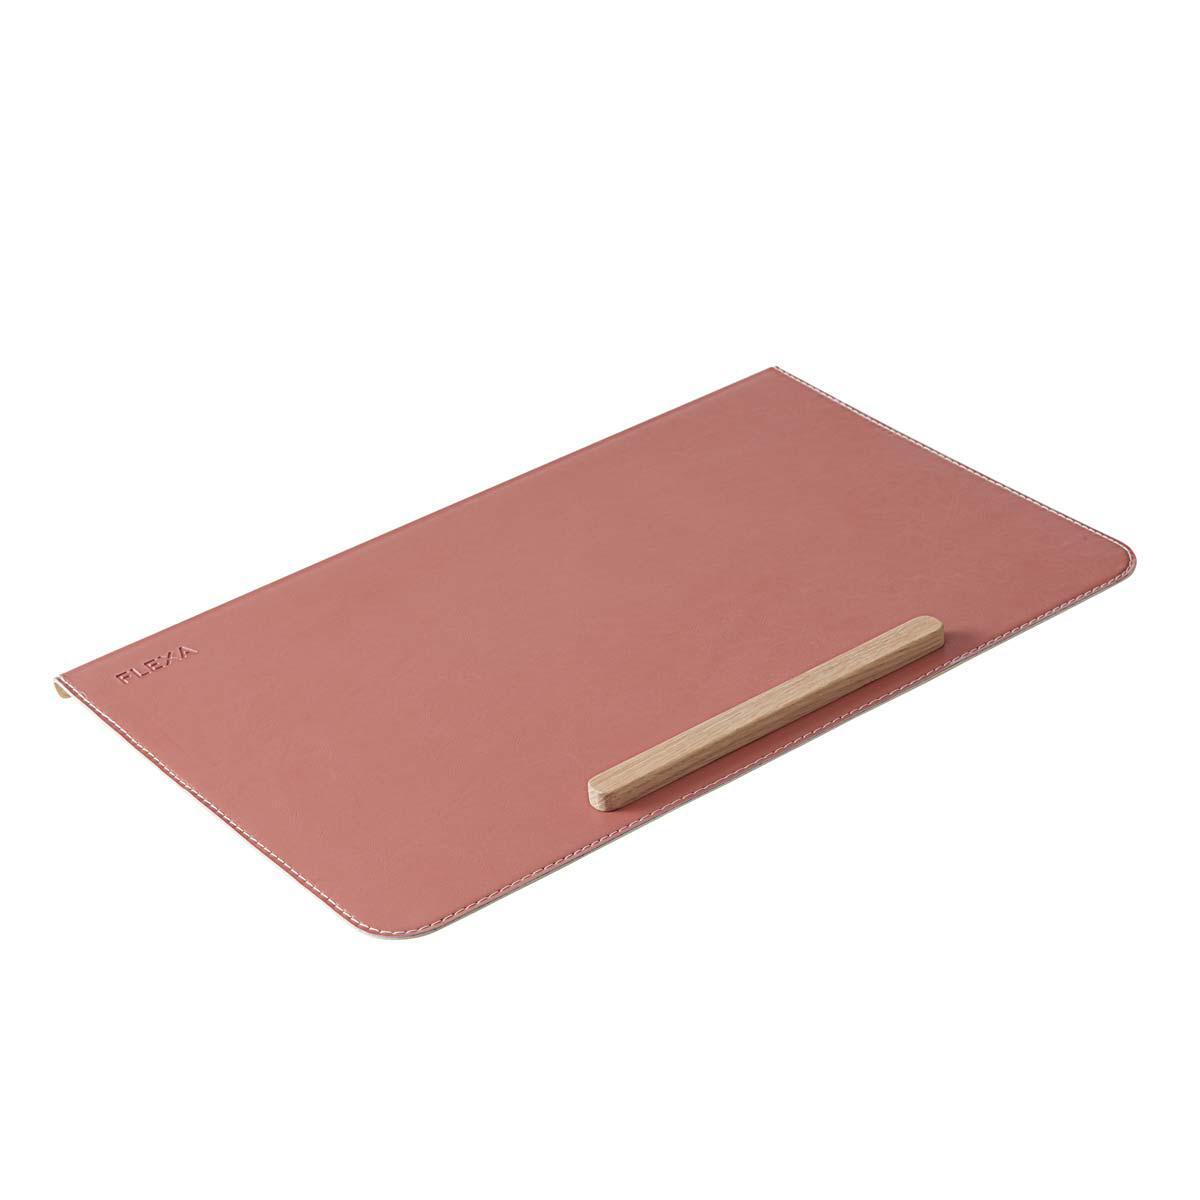 Protector escritorio EVO-MOBY-WOODY Flexa rosa